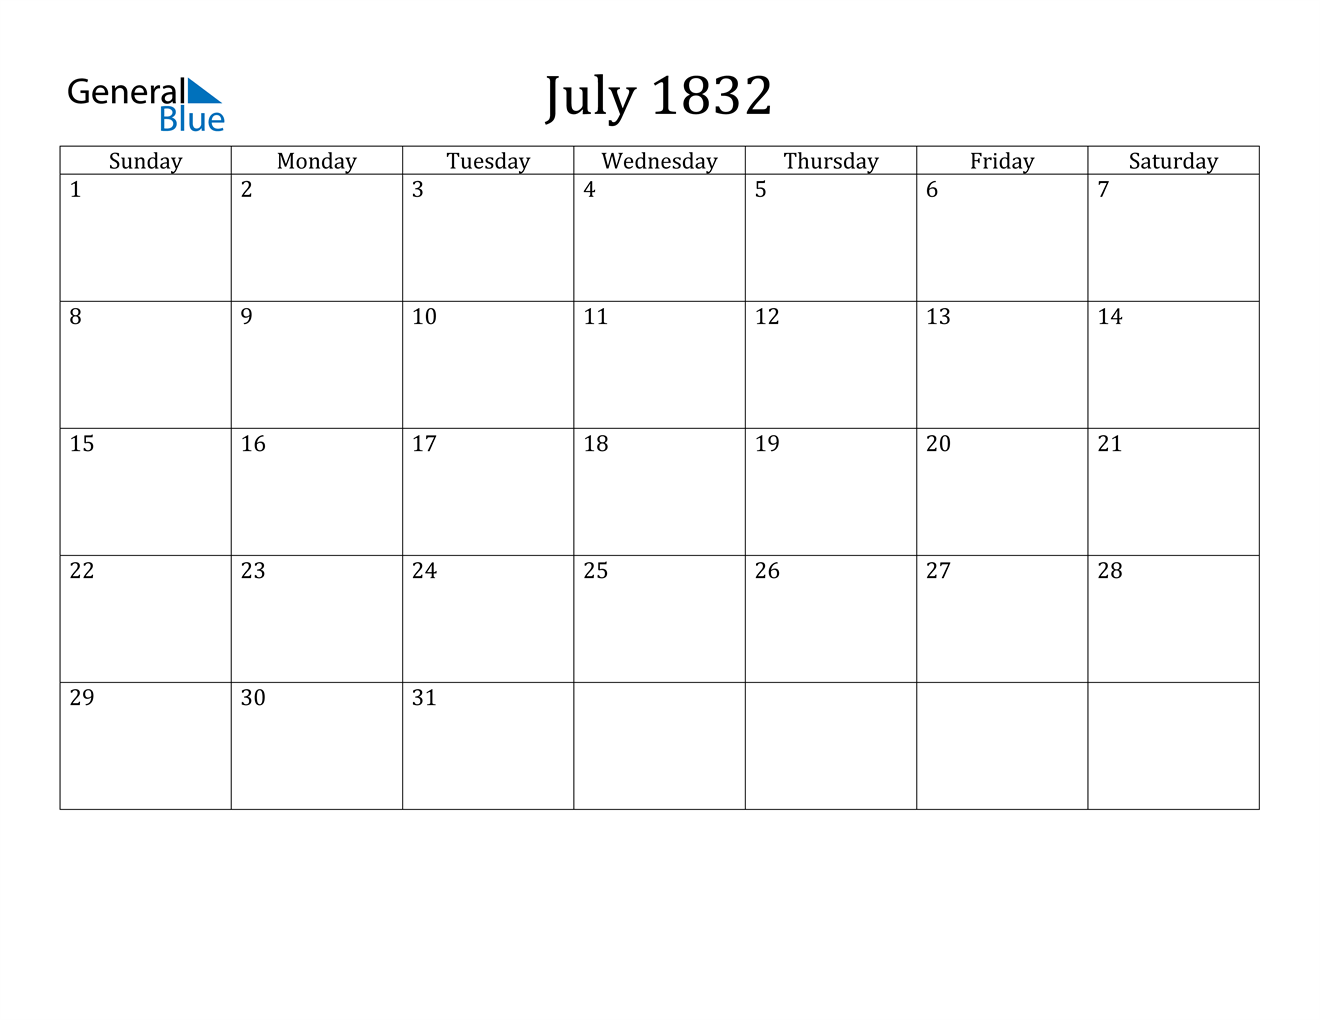 Image of July 1832 Calendar